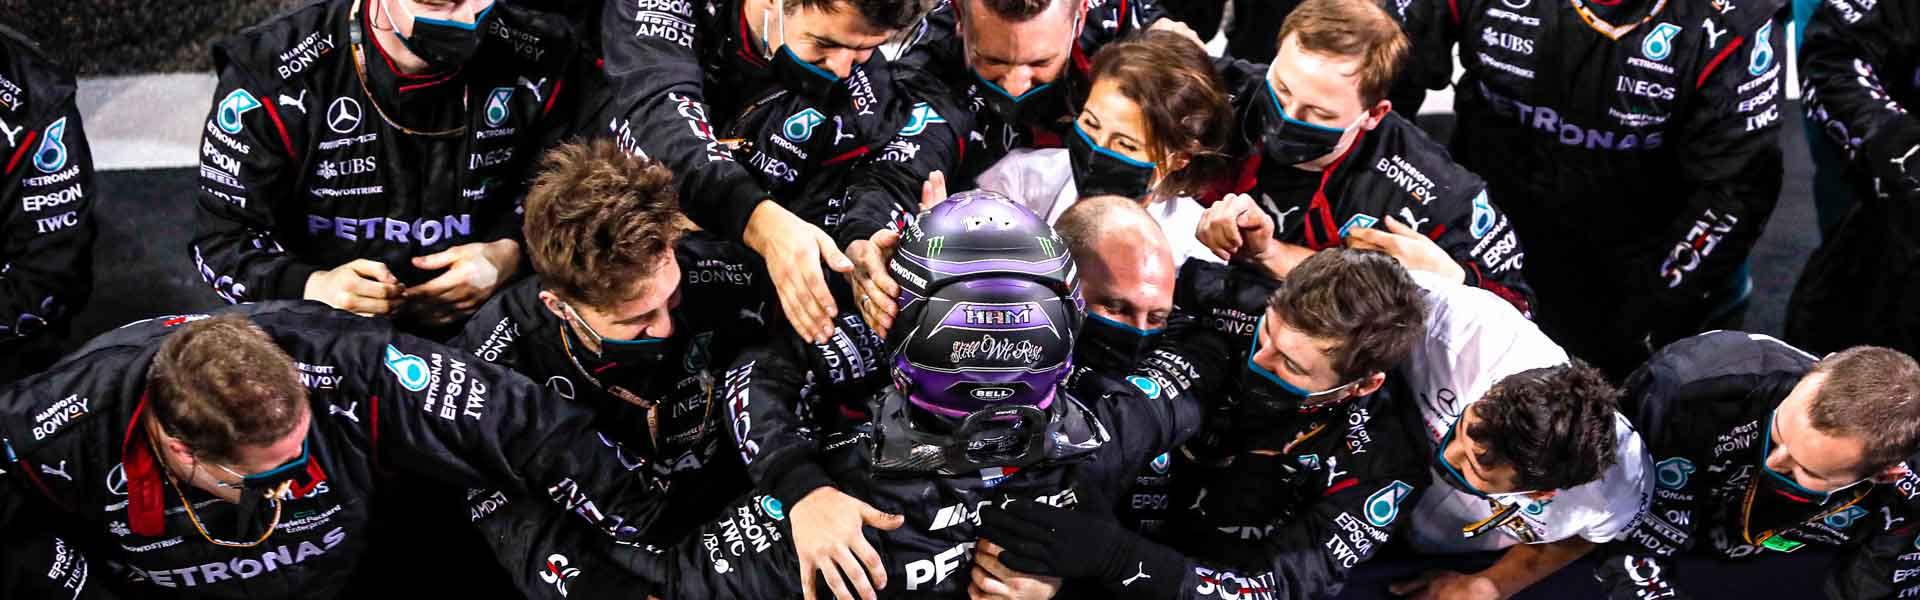 Lewis Hamilton wins the Bahrain Grand Prix!